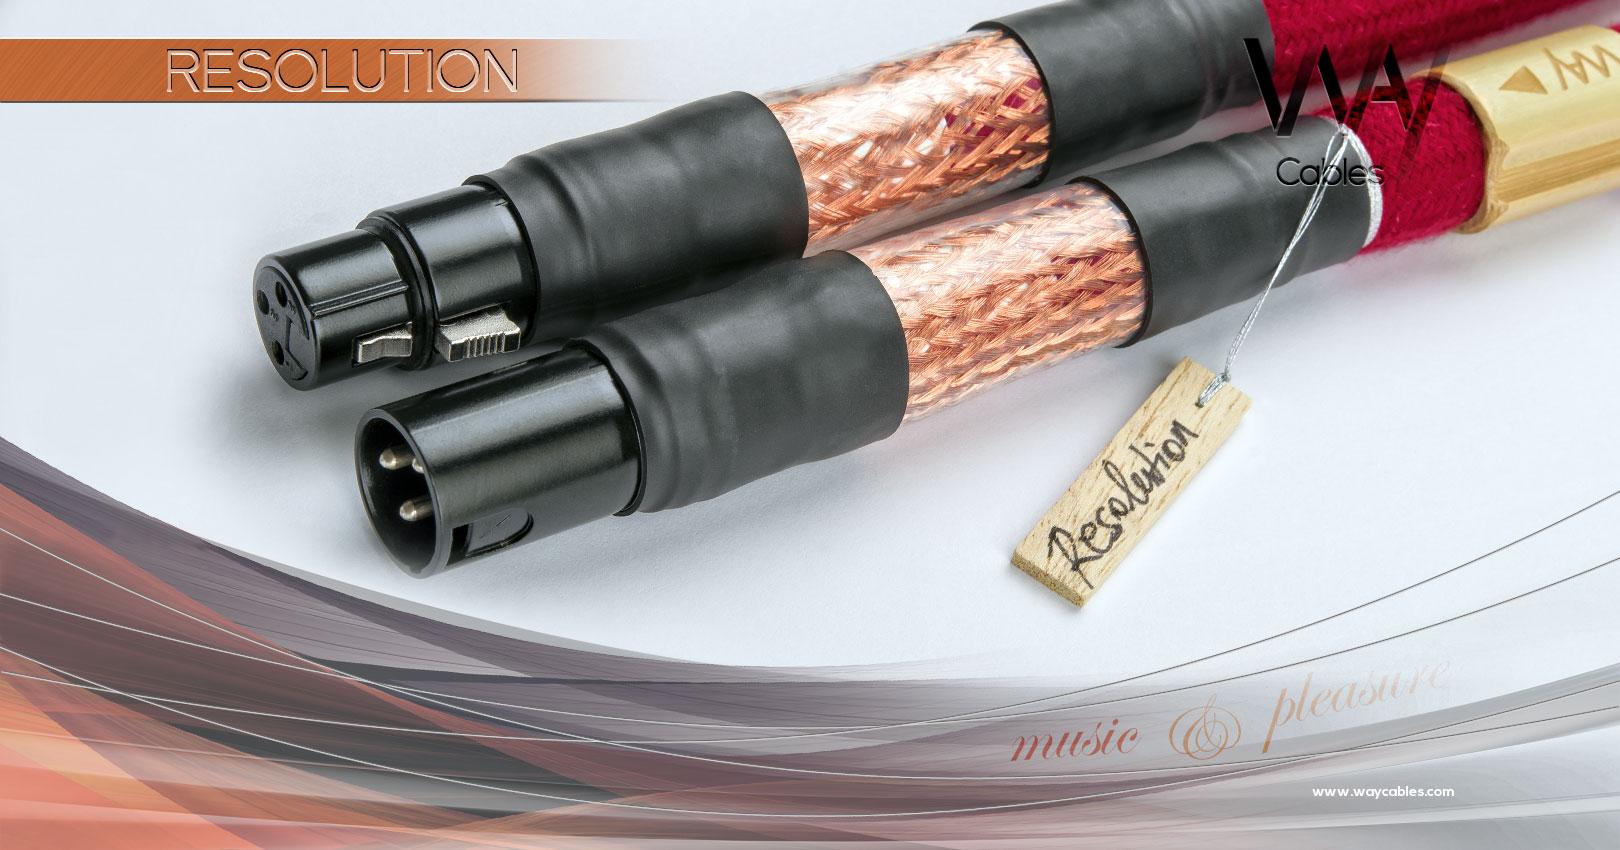 WAY Cables - RESOLUTION - digital XLR / AES-EBU audio cable